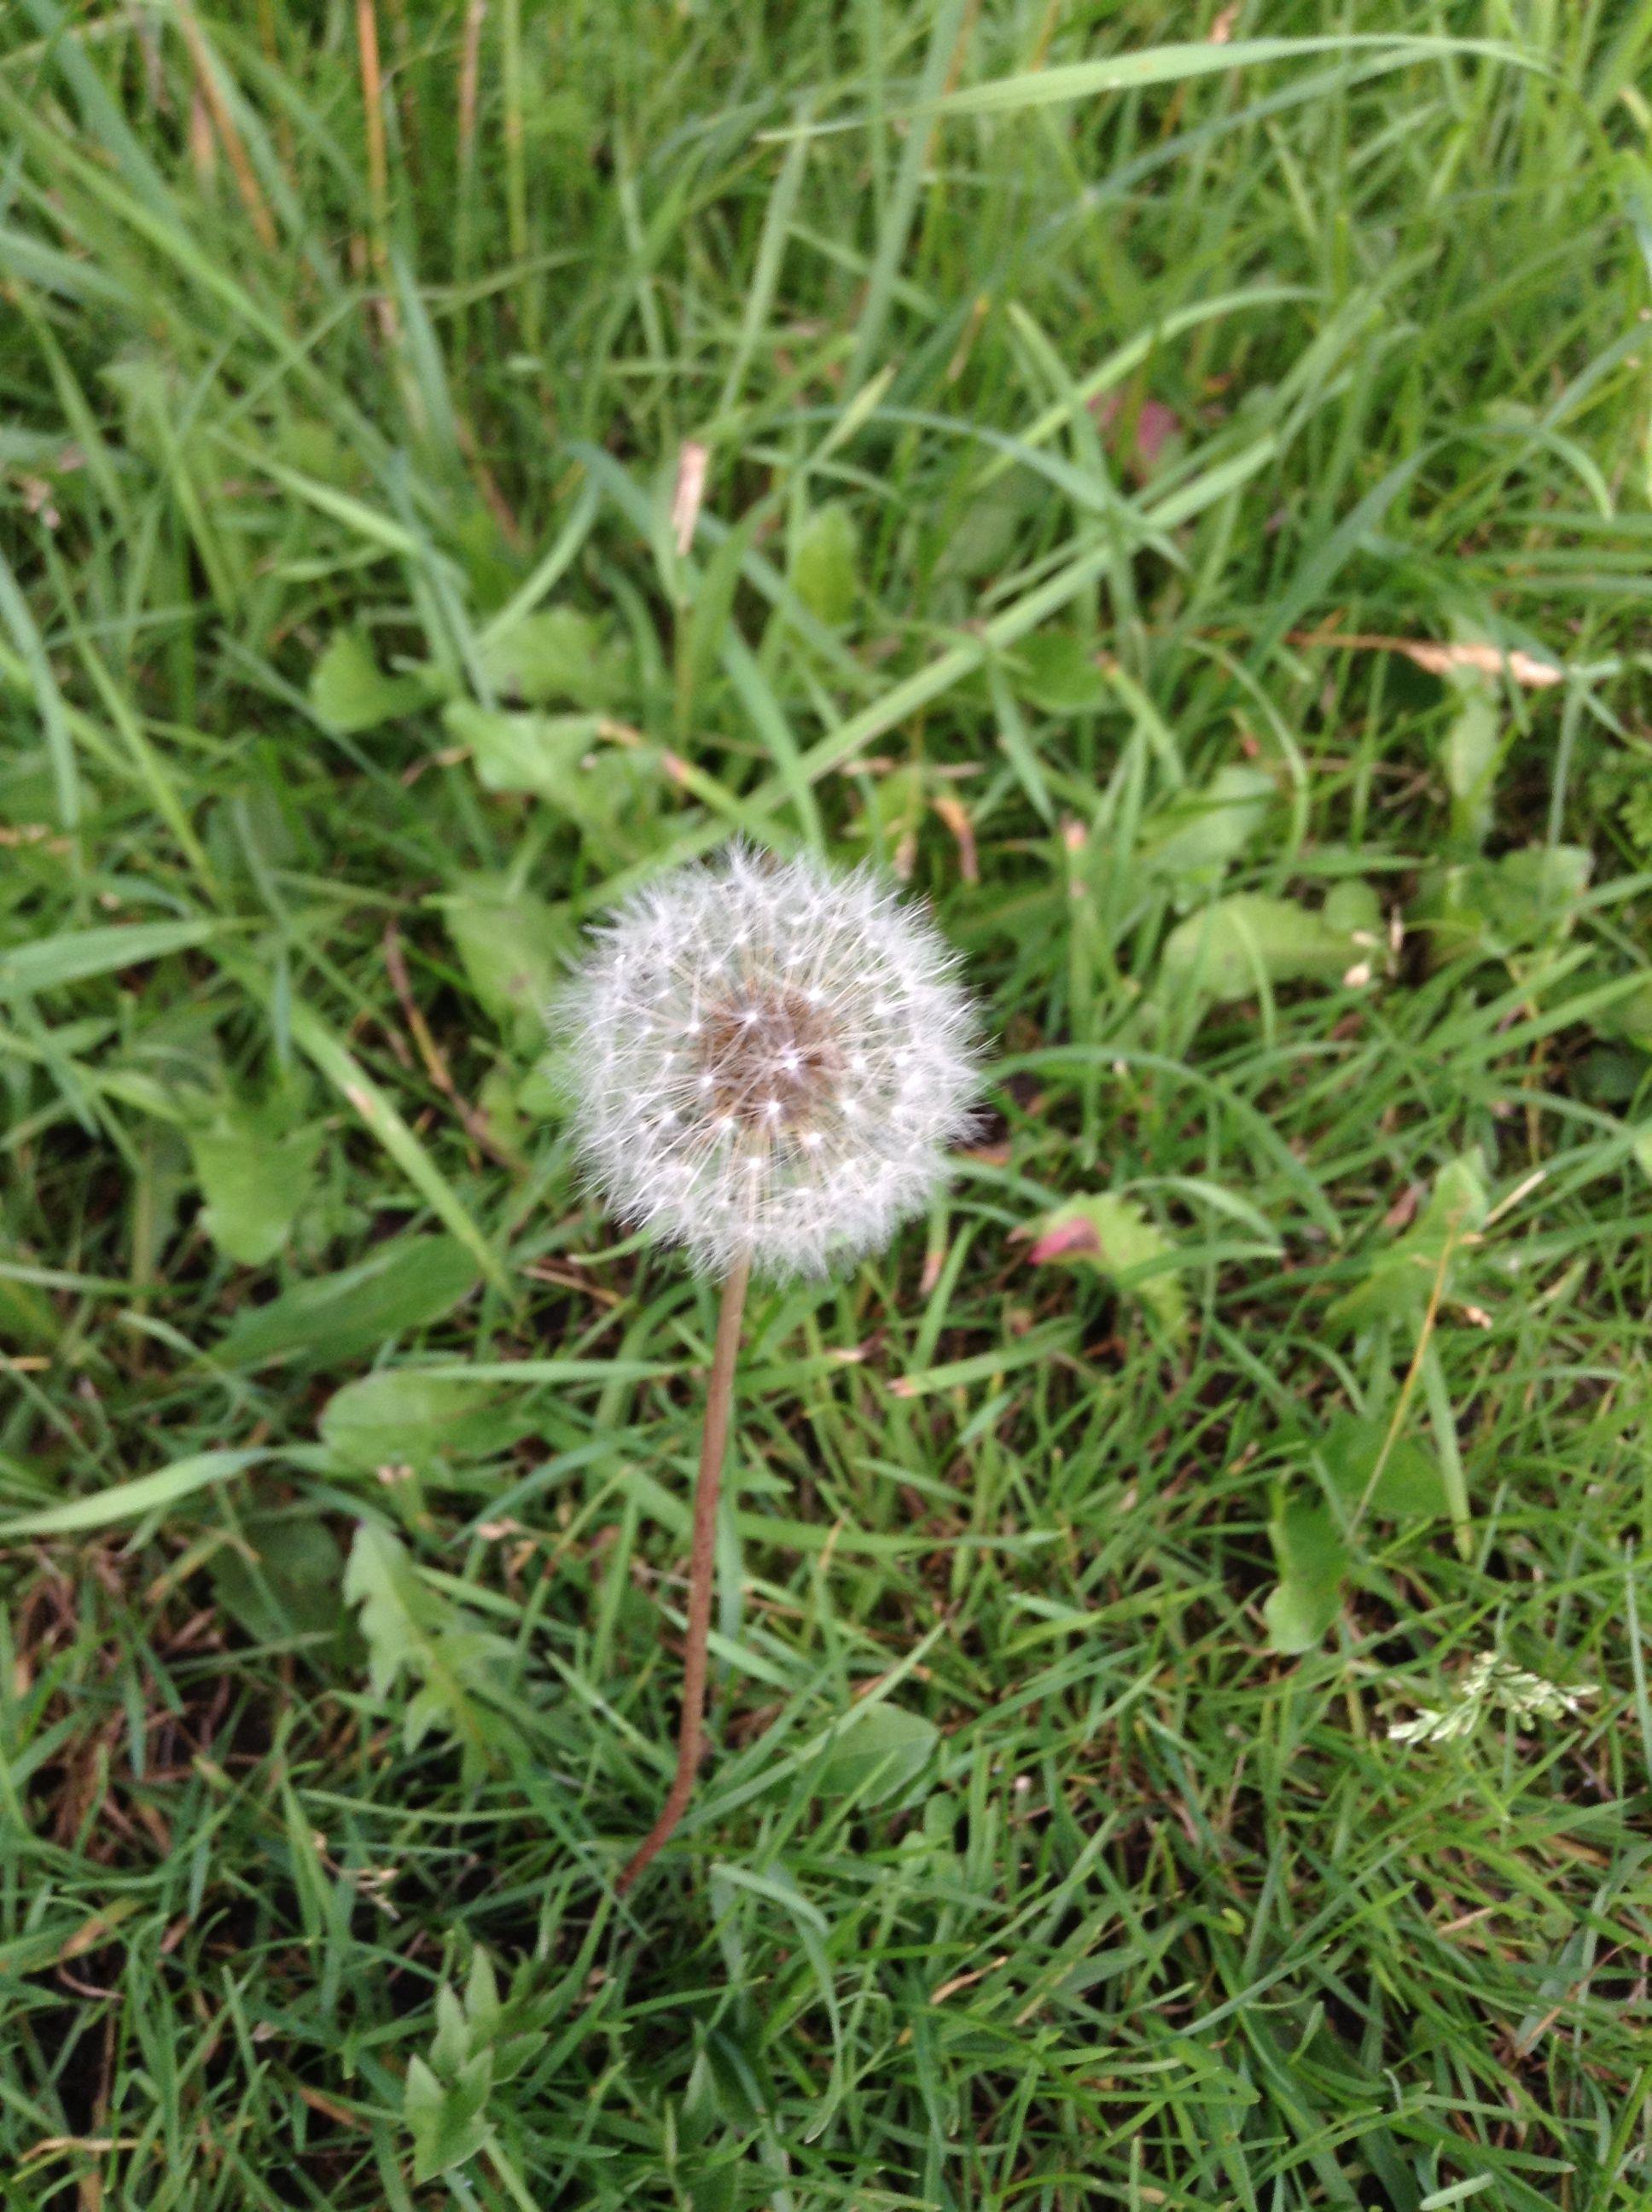 Make a wish, DREAM BIG!!!